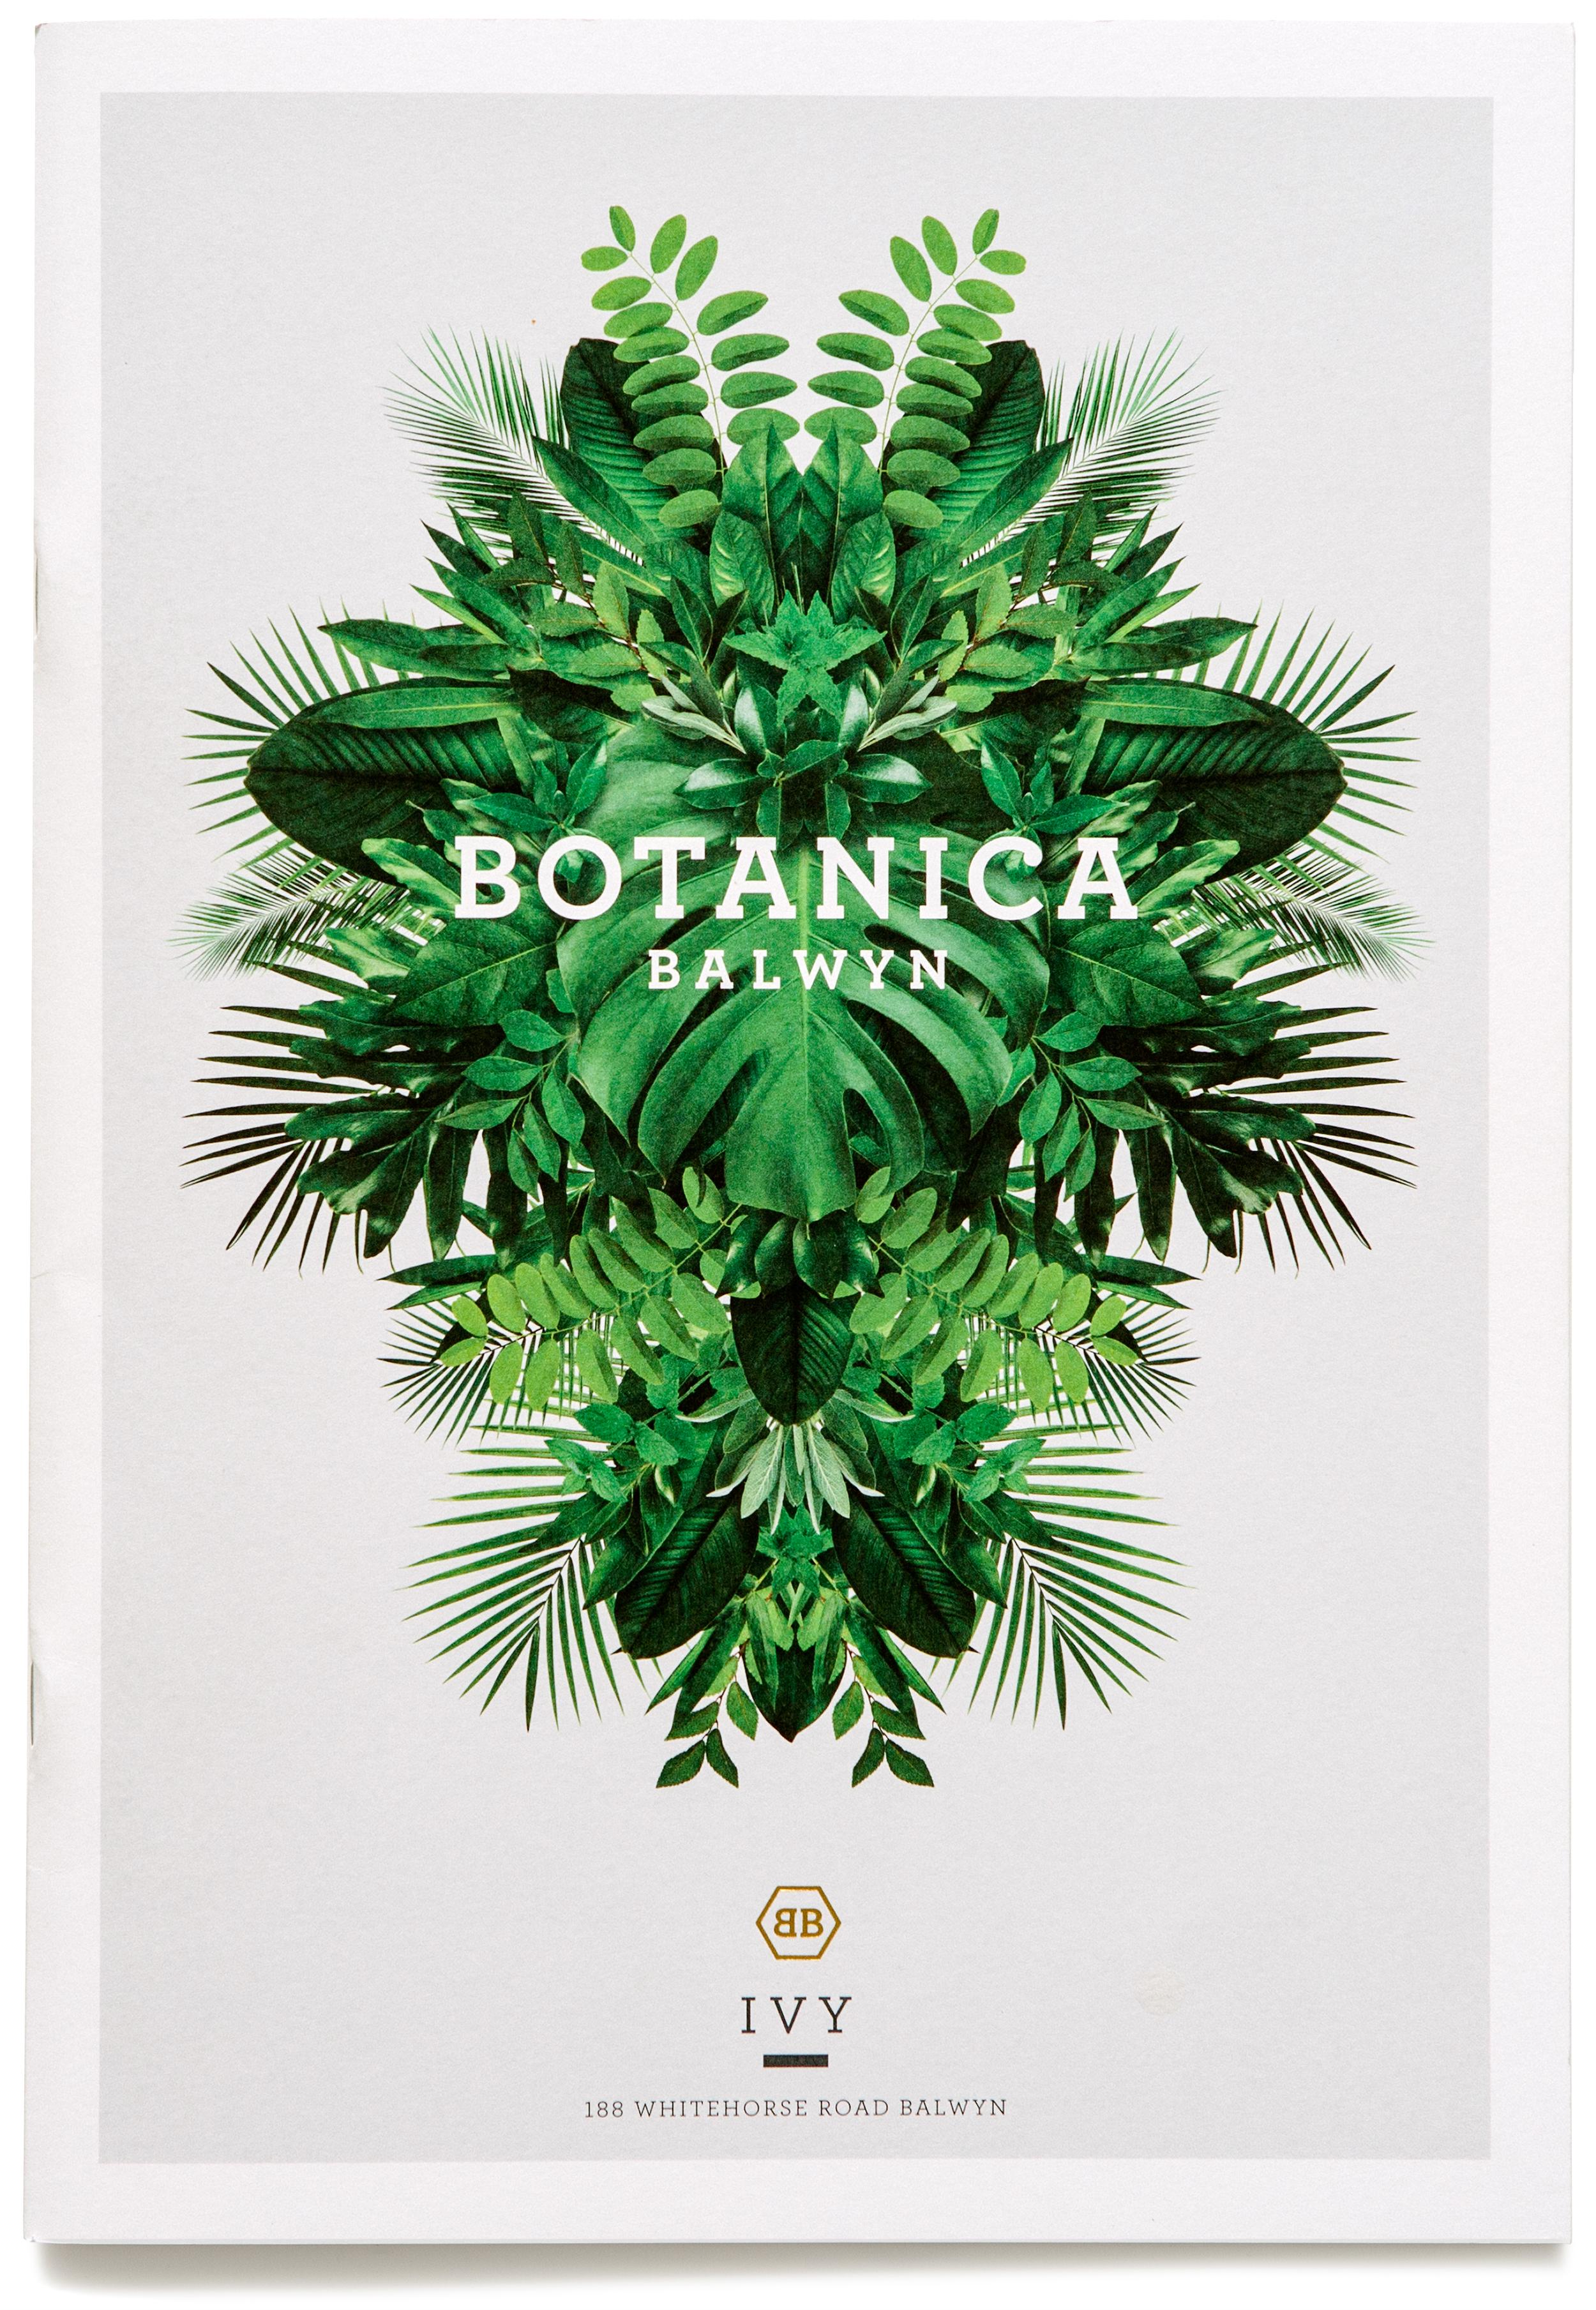 'Botanica' apartment brochure